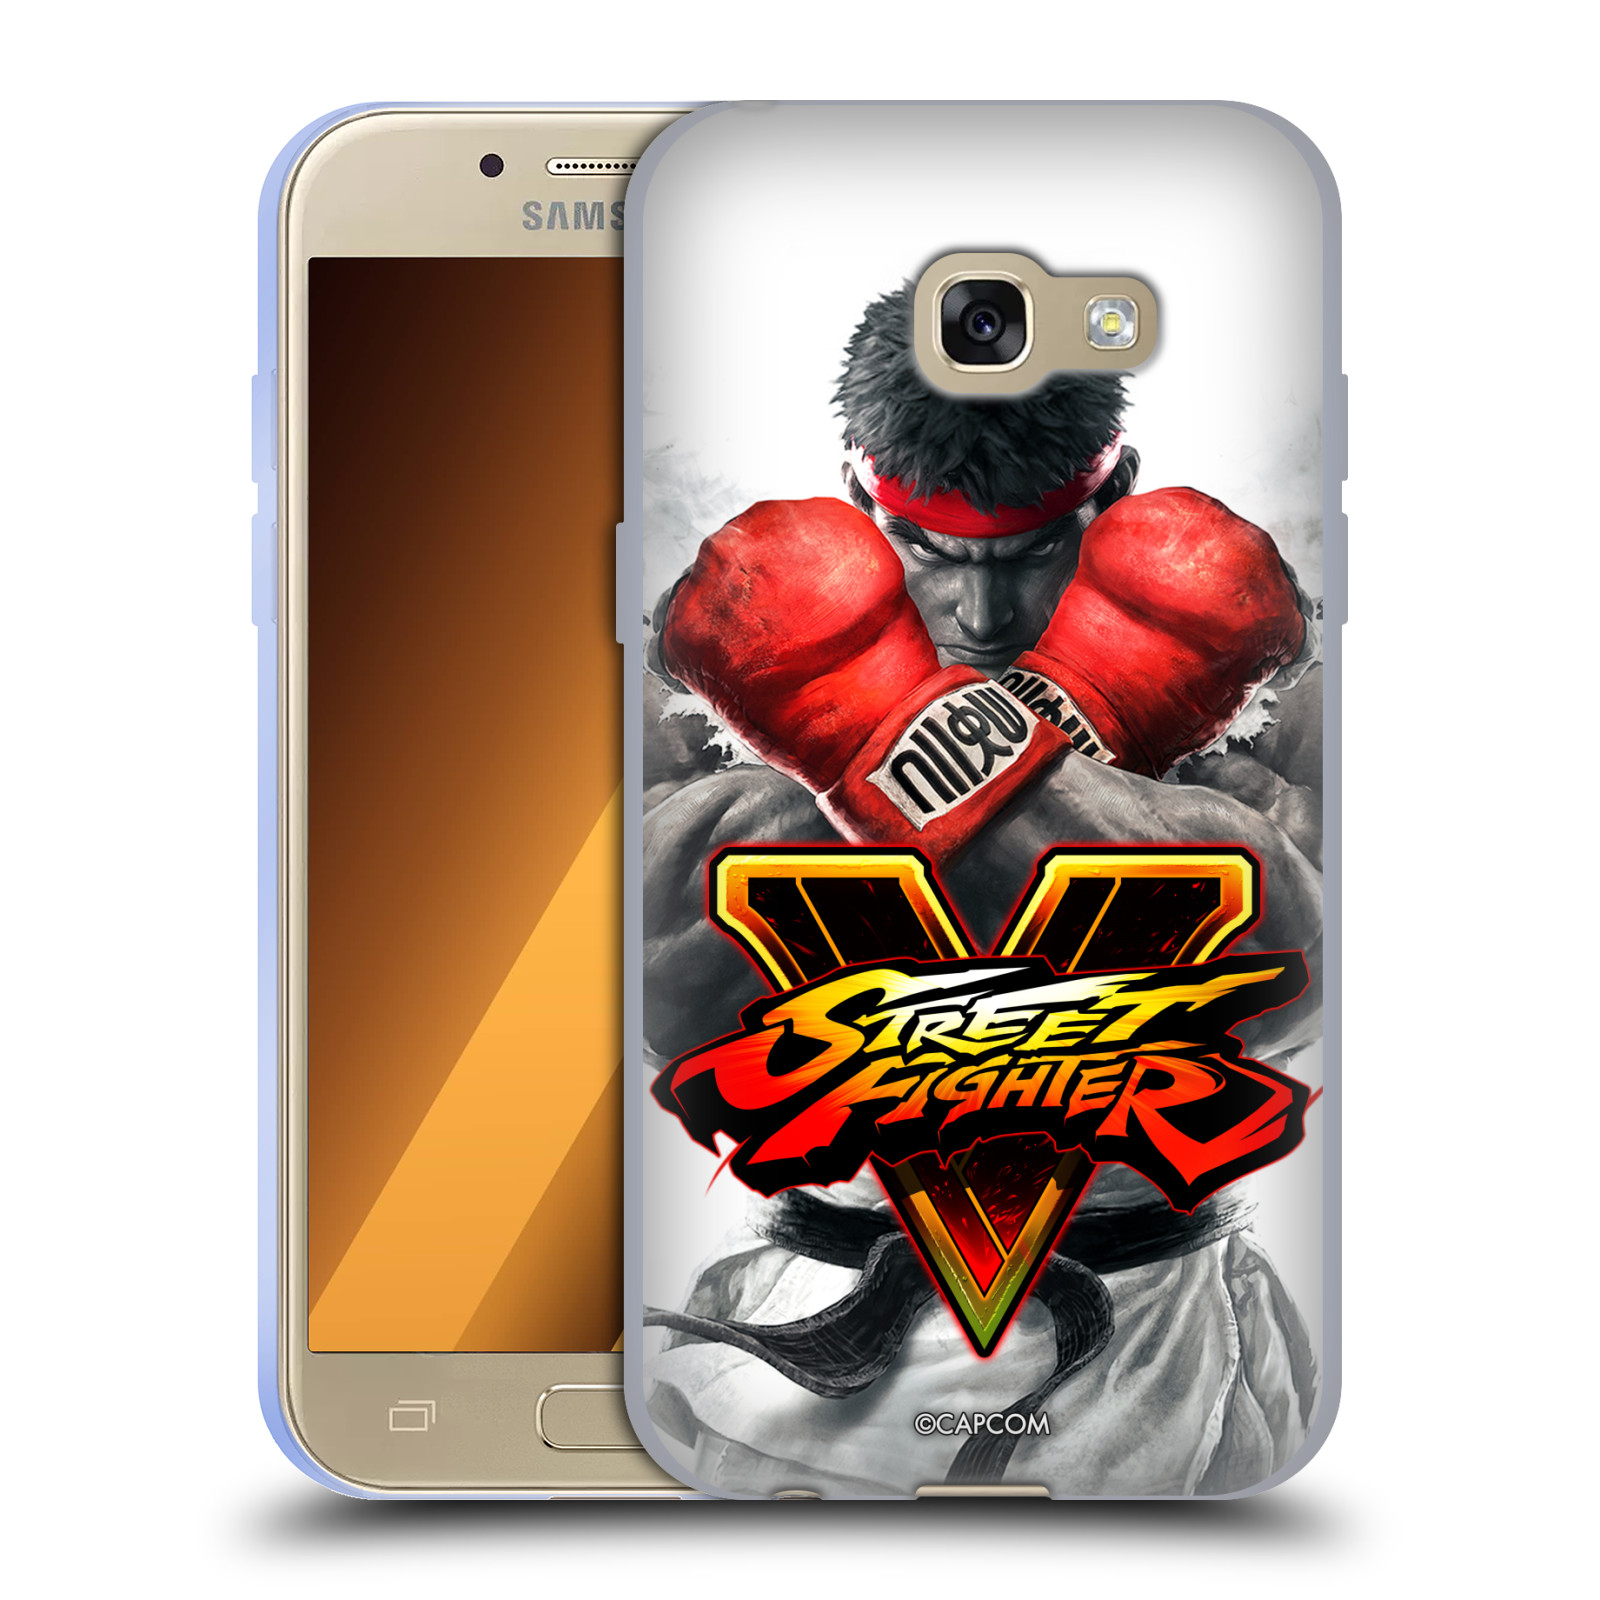 HEAD CASE silikonový obal na mobil Samsung Galaxy A3 2017 (A320) oficiální kryt STREET FIGHTER Boxer Ryu